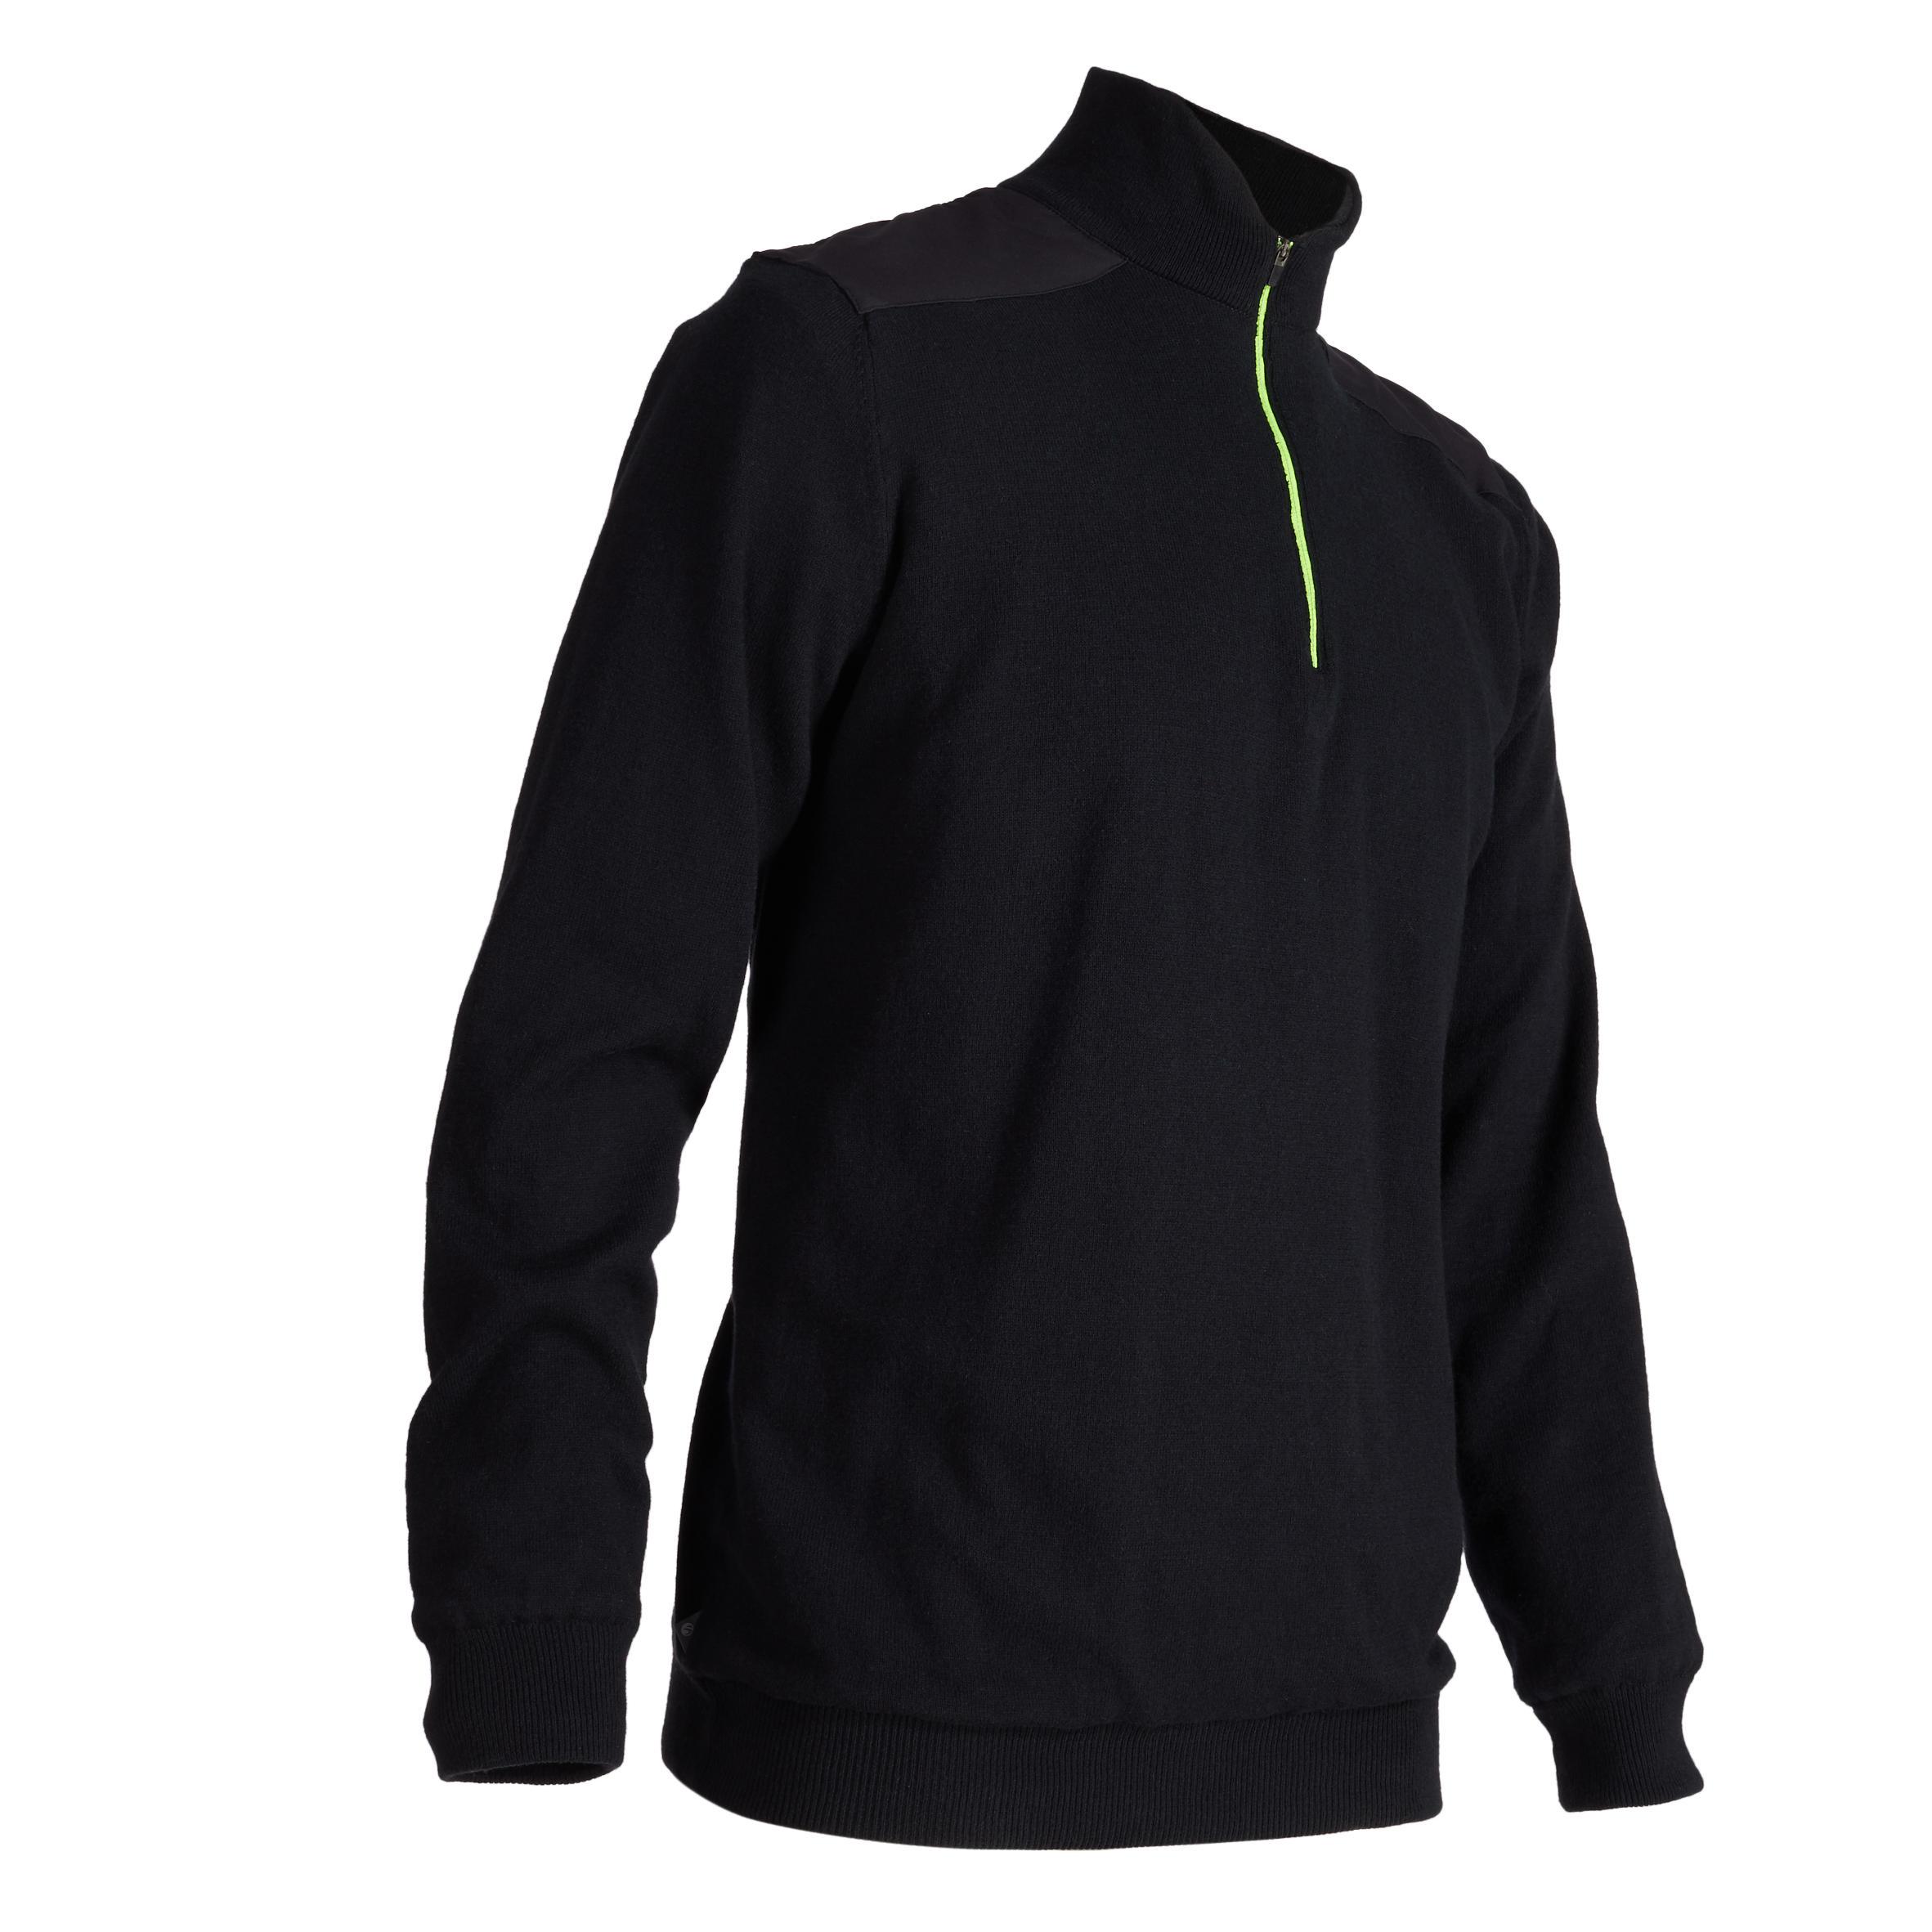 6a708aef099fb Pullover, Sweatshirts, Langarmshirts Herren   DECATHLON